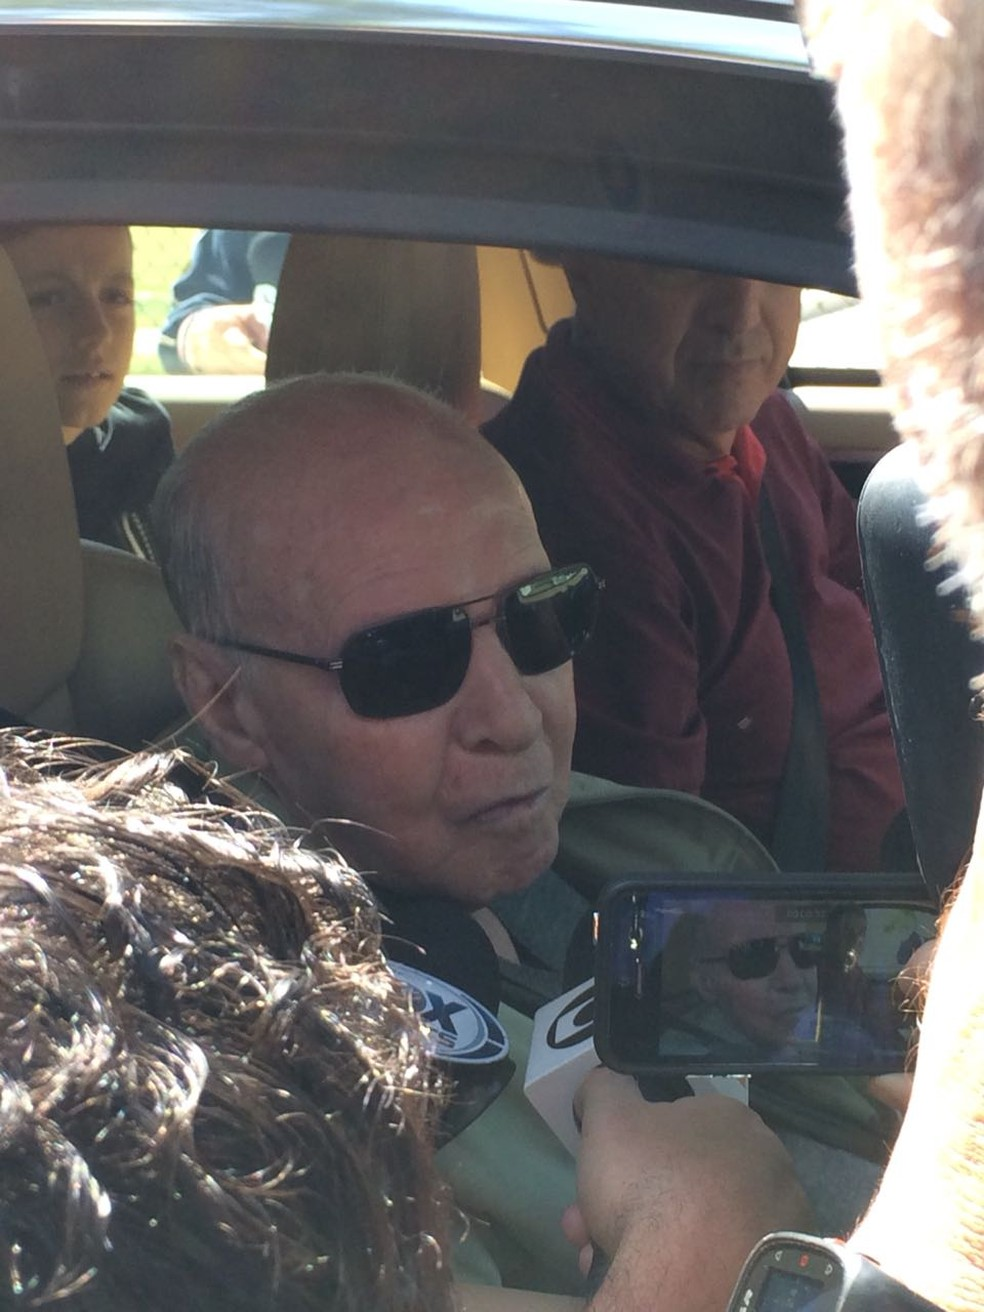 Zagallo chegou à Granja de carro na manhã desta quinta-feira (Foto: Victor Pozella)